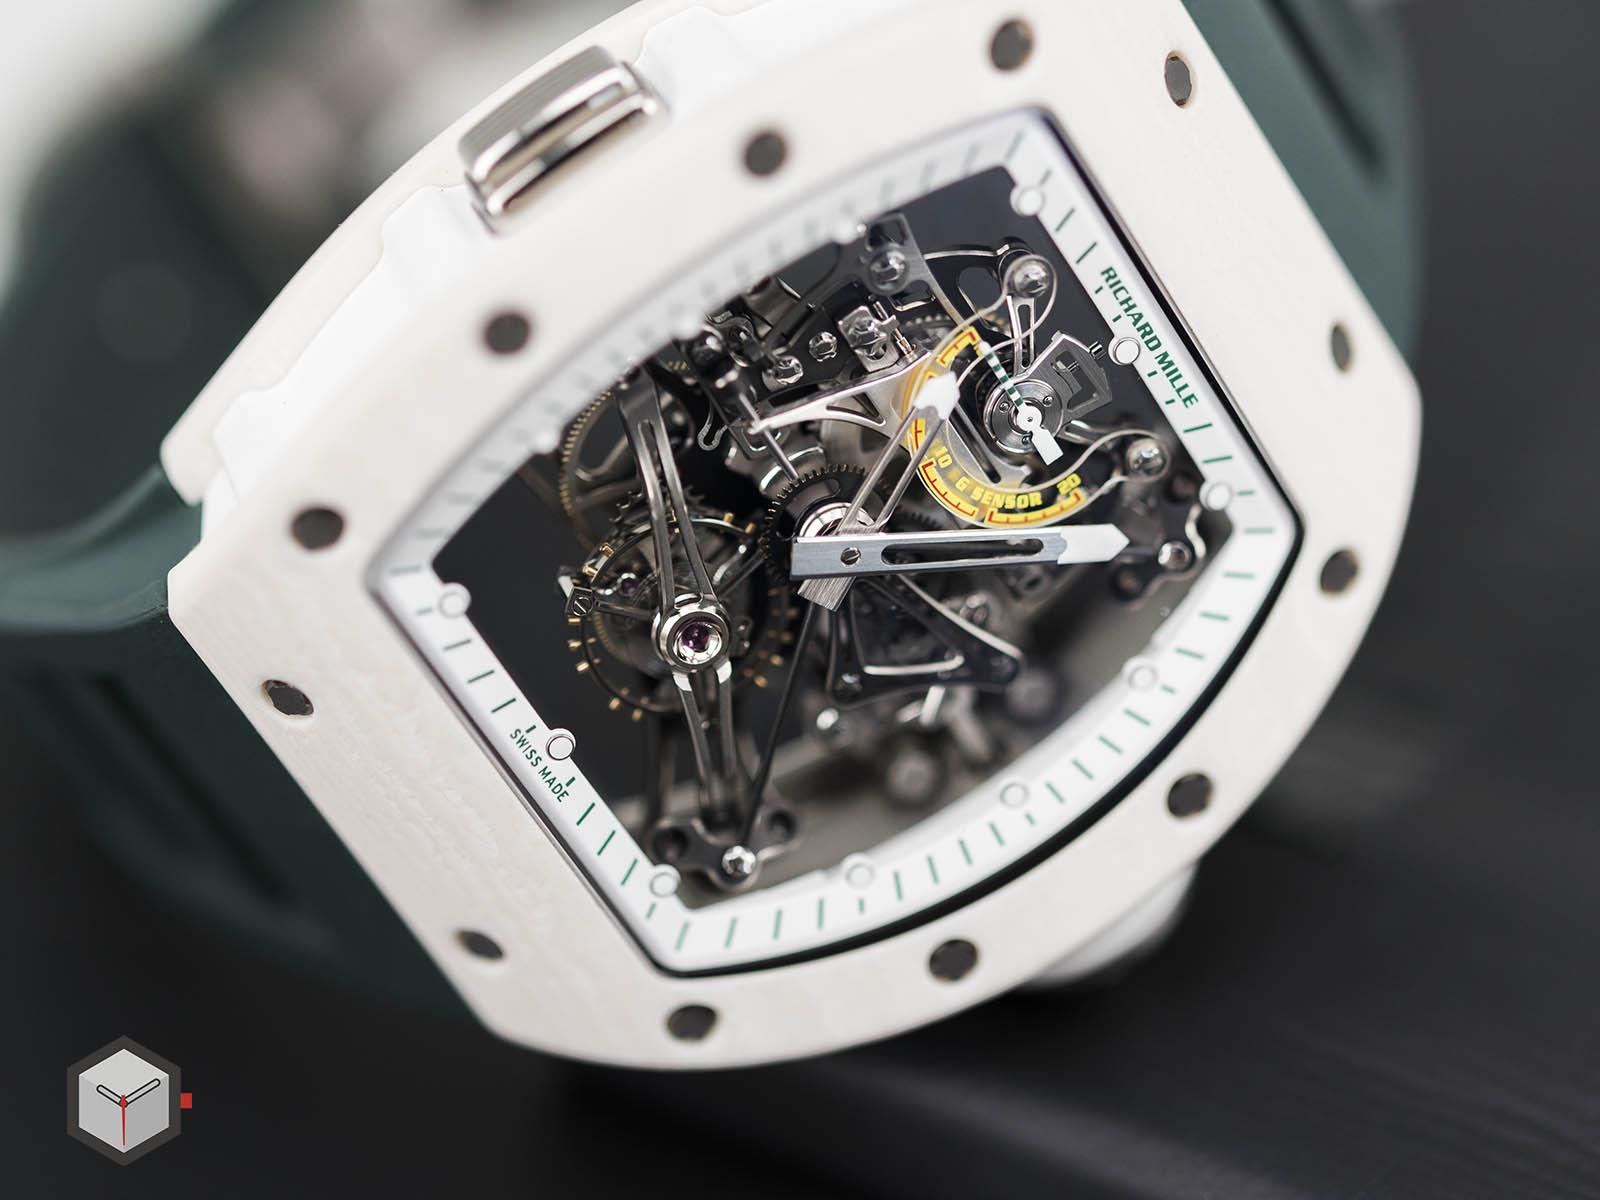 rm38-01-richard-mille-tourbillon-g-sensor-bubba-watson-2.jpg